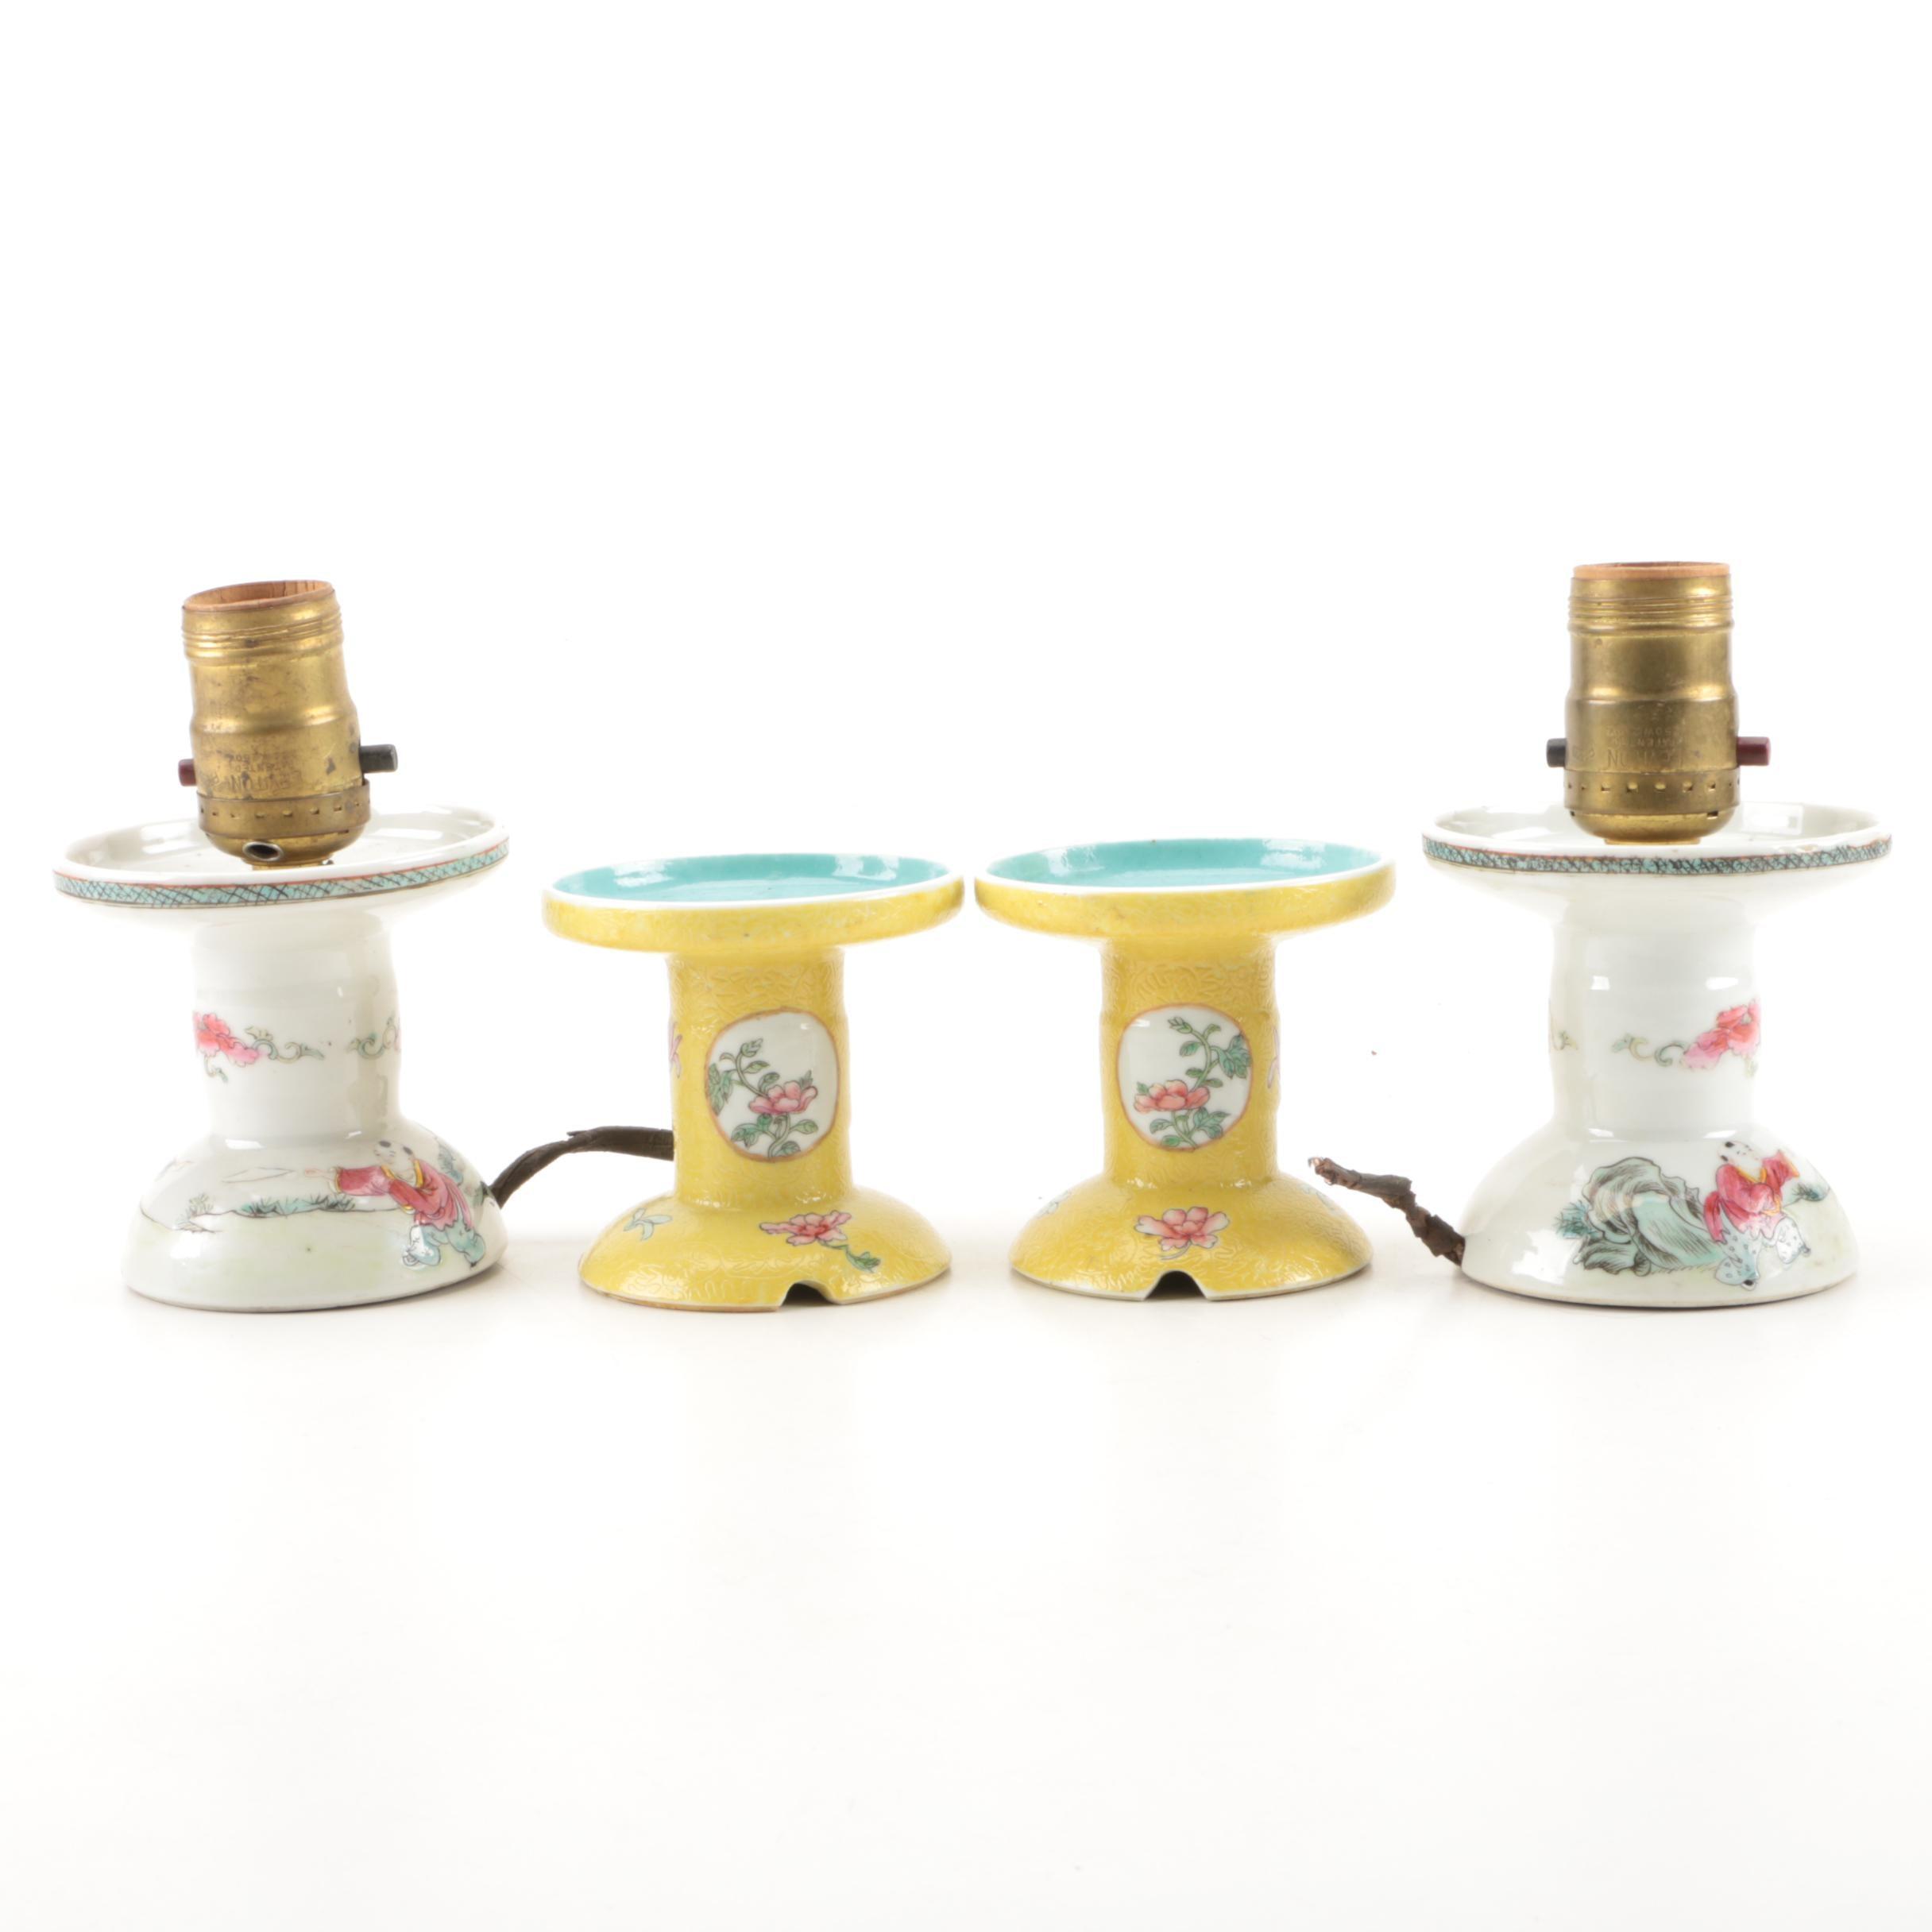 Vintage Asian Style Ceramic Lamp Bases